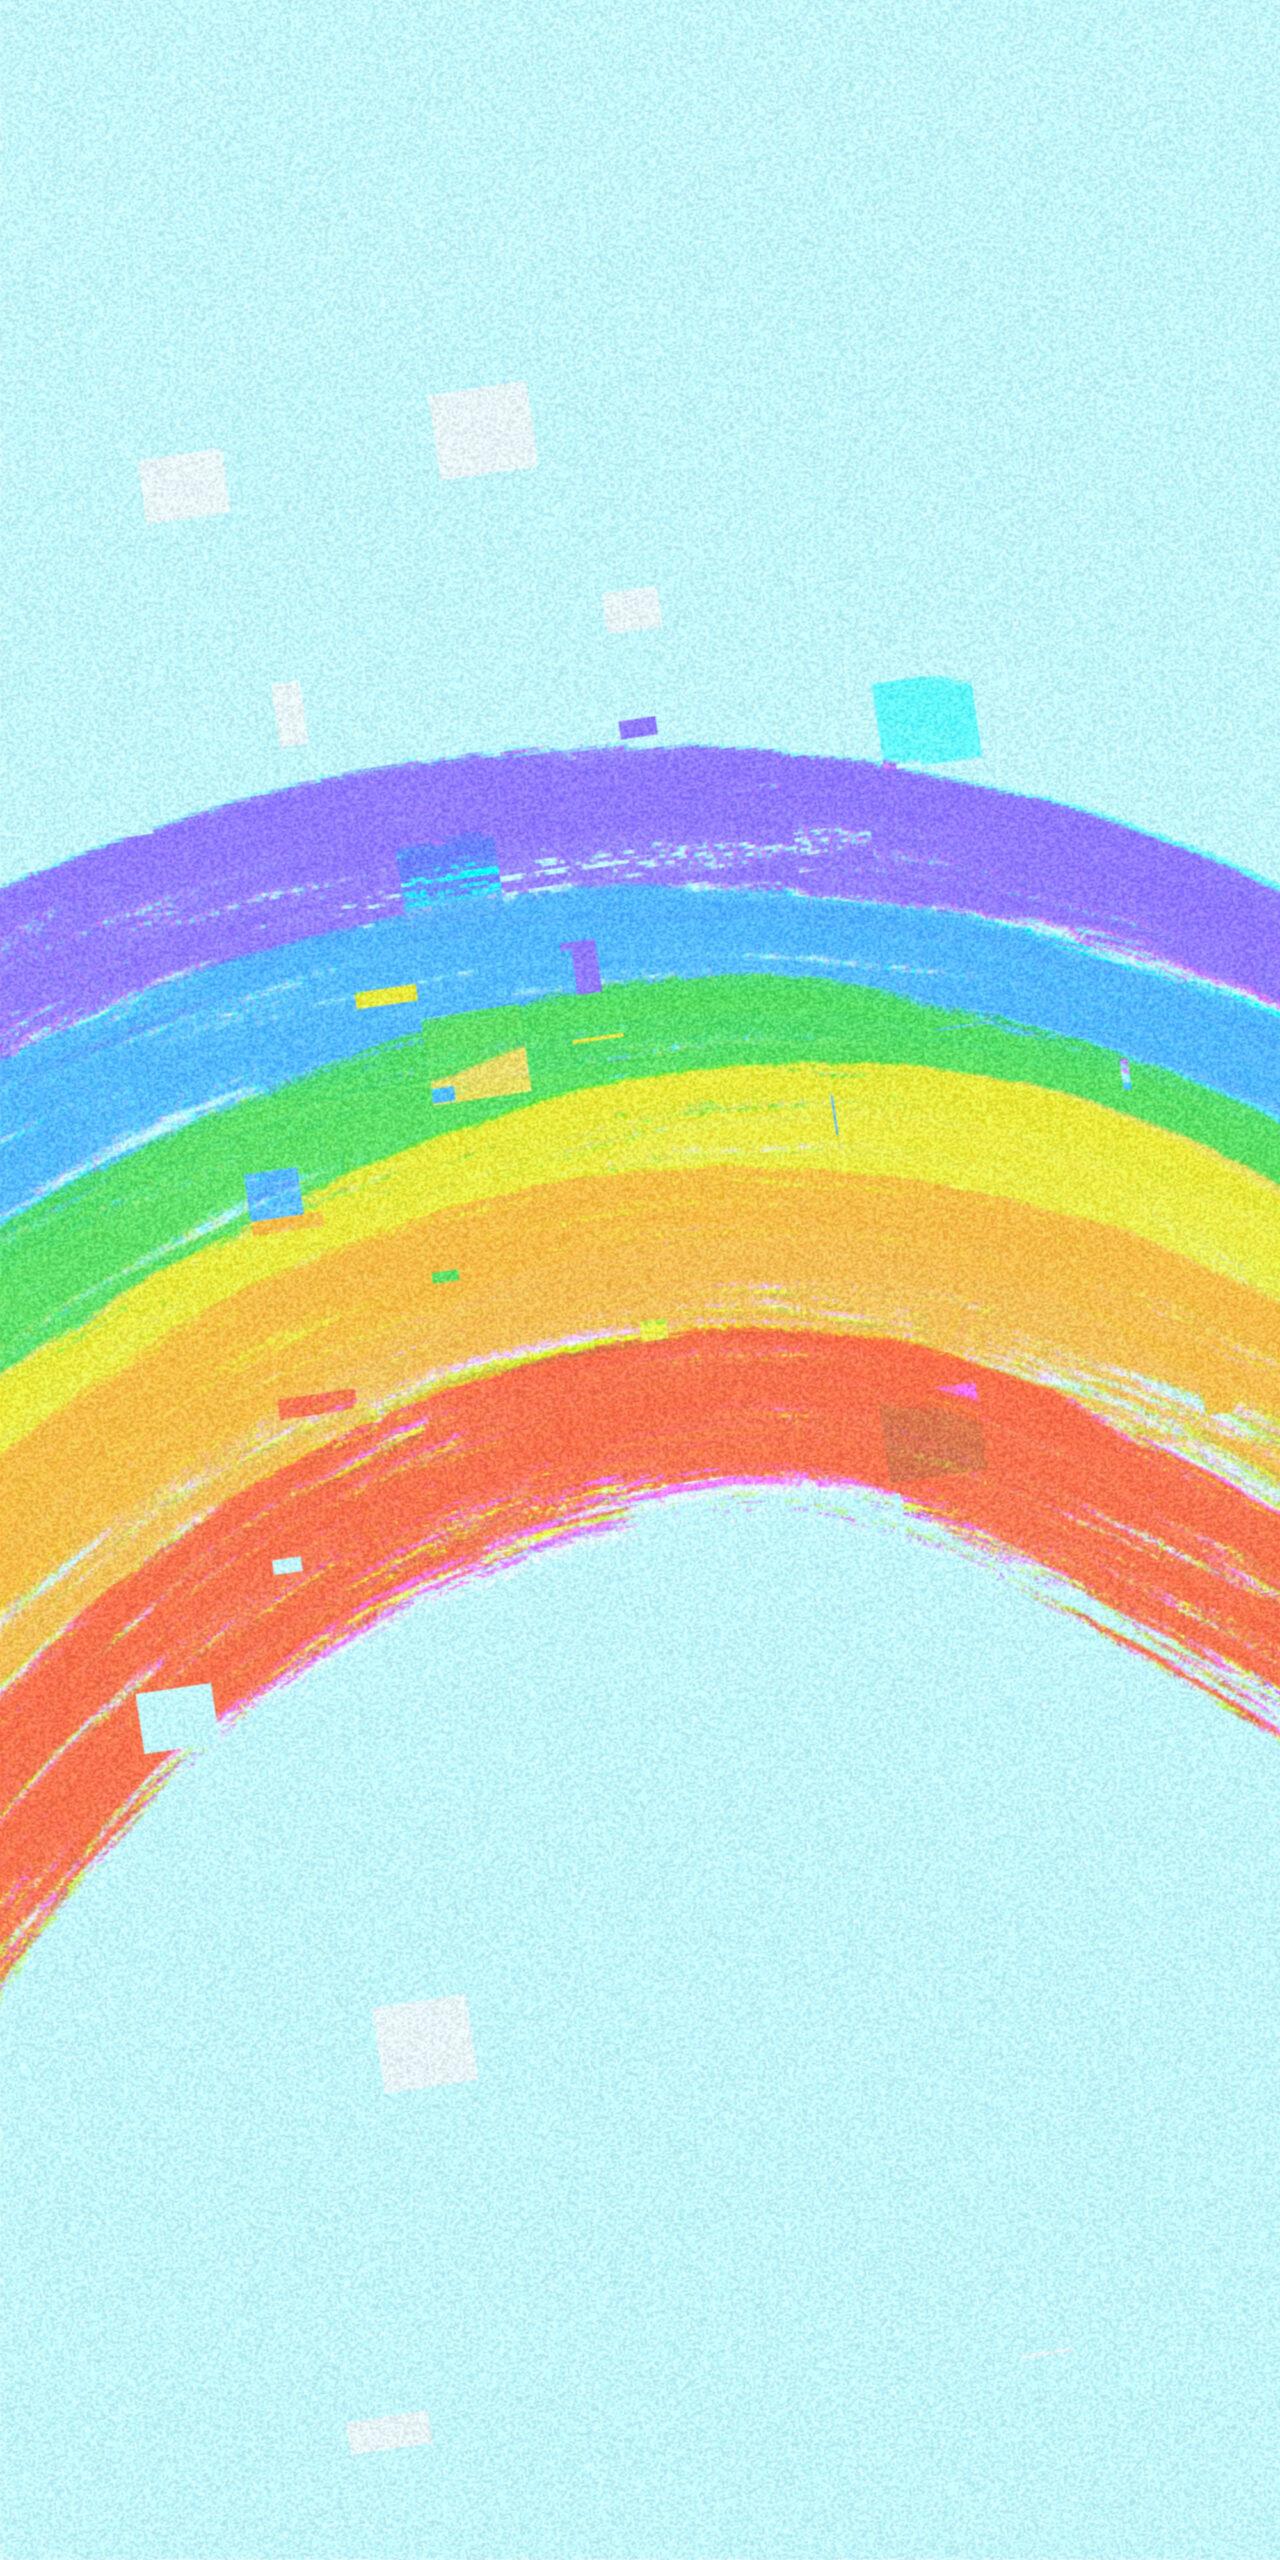 rainbow blue background